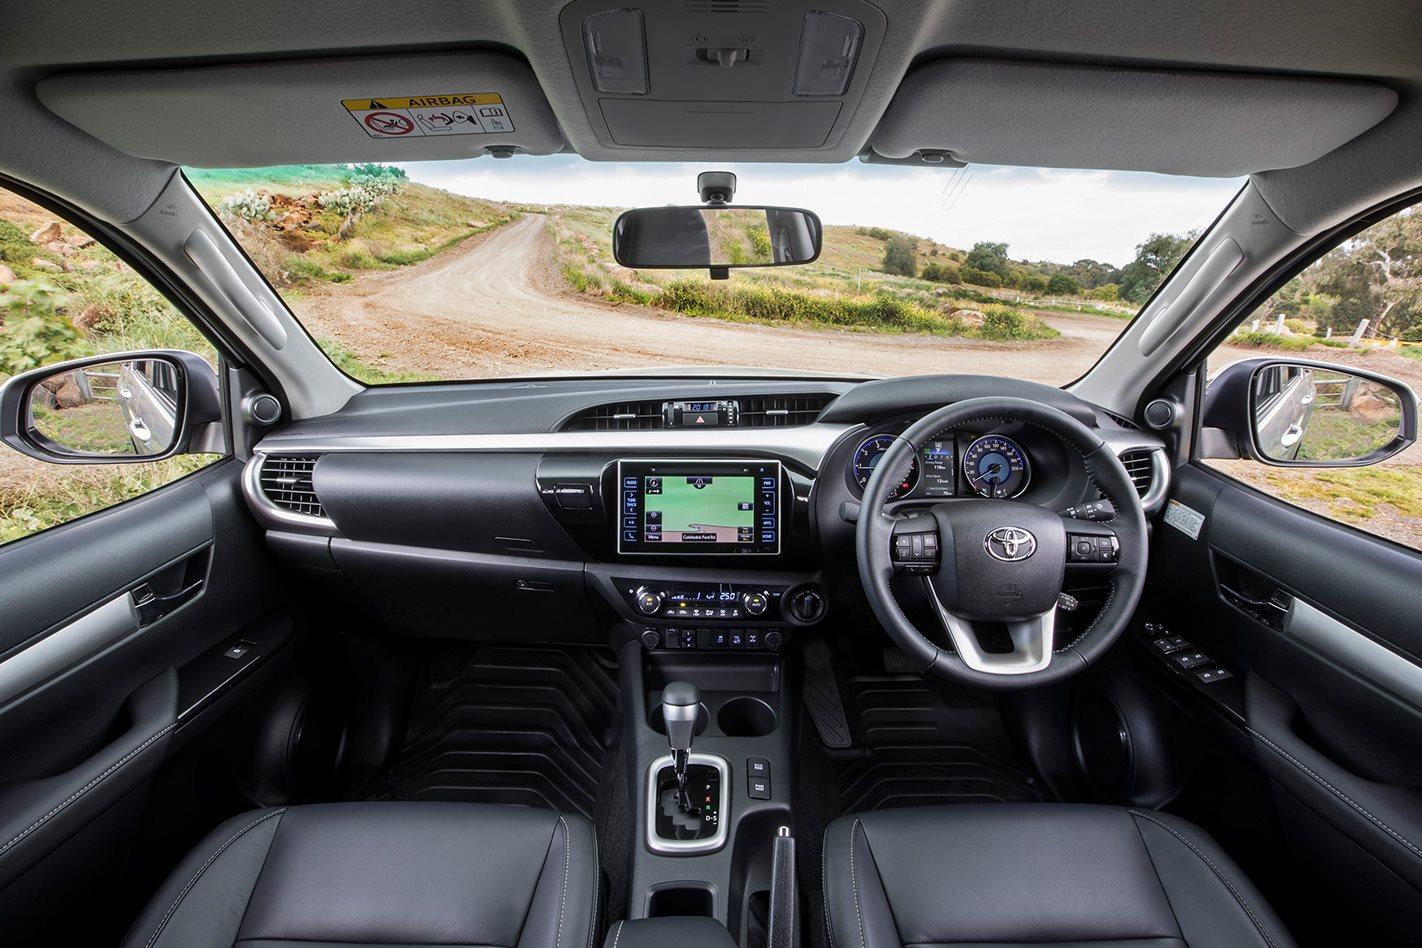 2017-Toyota-Hilux-cabin.jpg